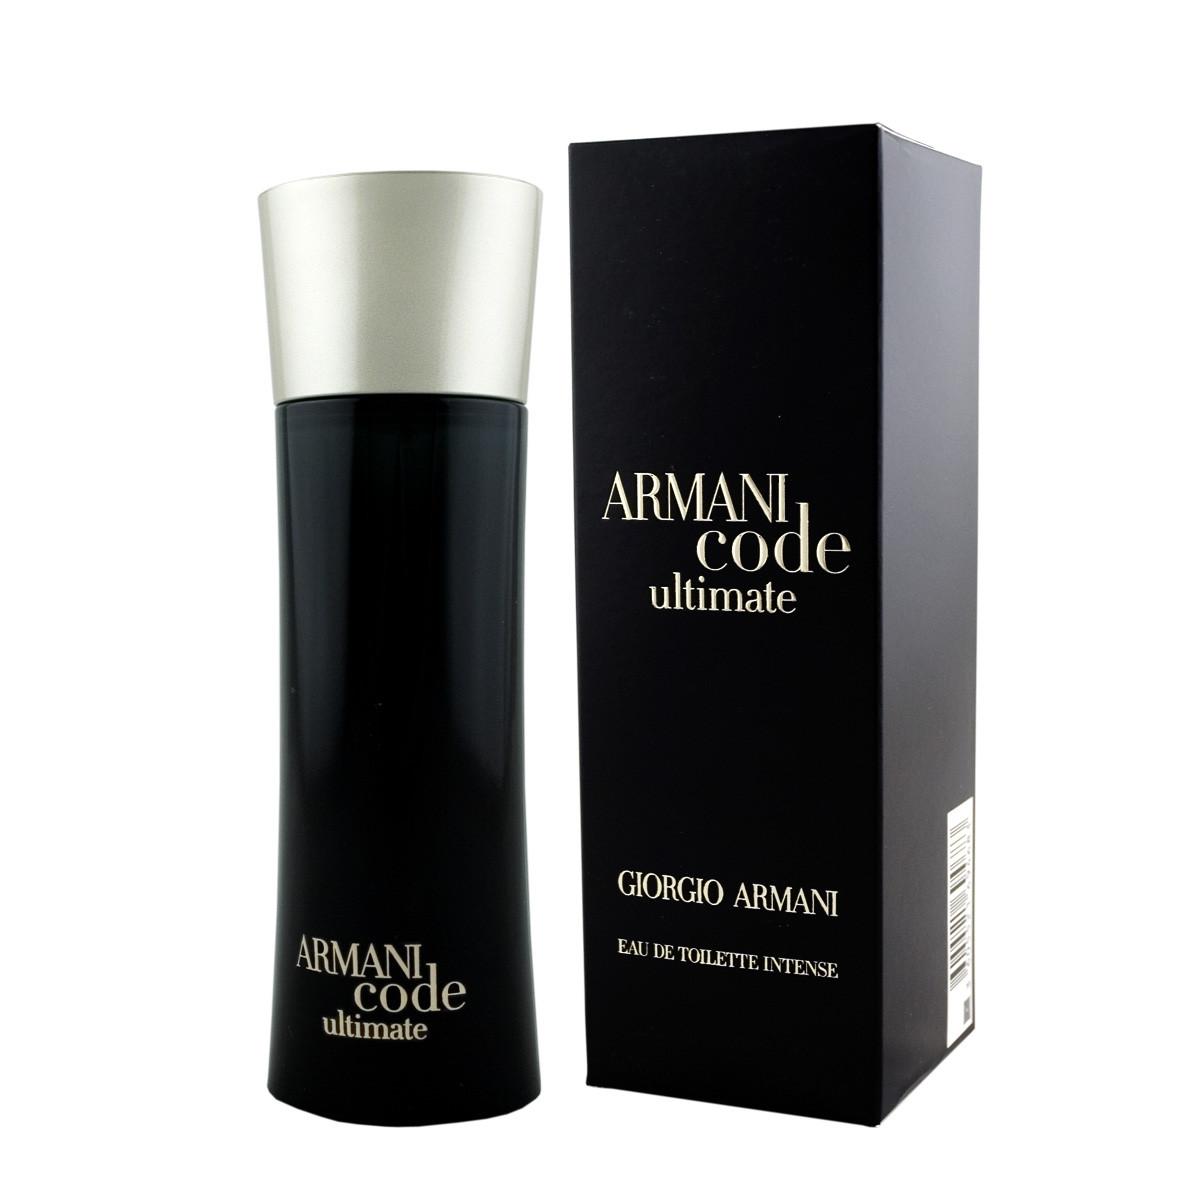 armani giorgio code ultimate intense eau de toilette 75 ml. Black Bedroom Furniture Sets. Home Design Ideas